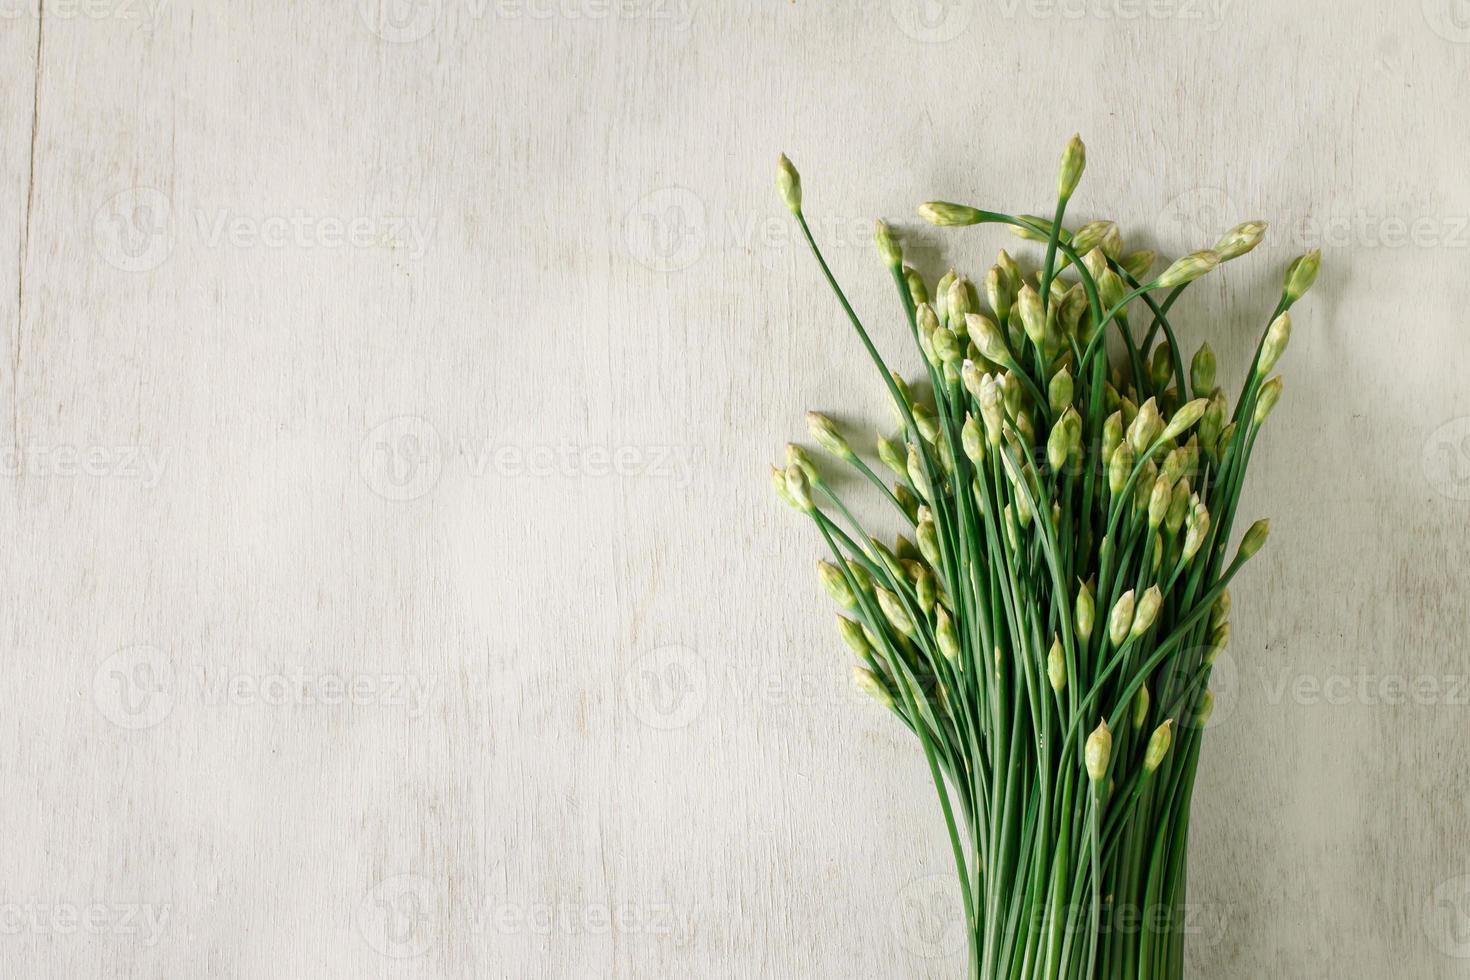 Garlic chives photo